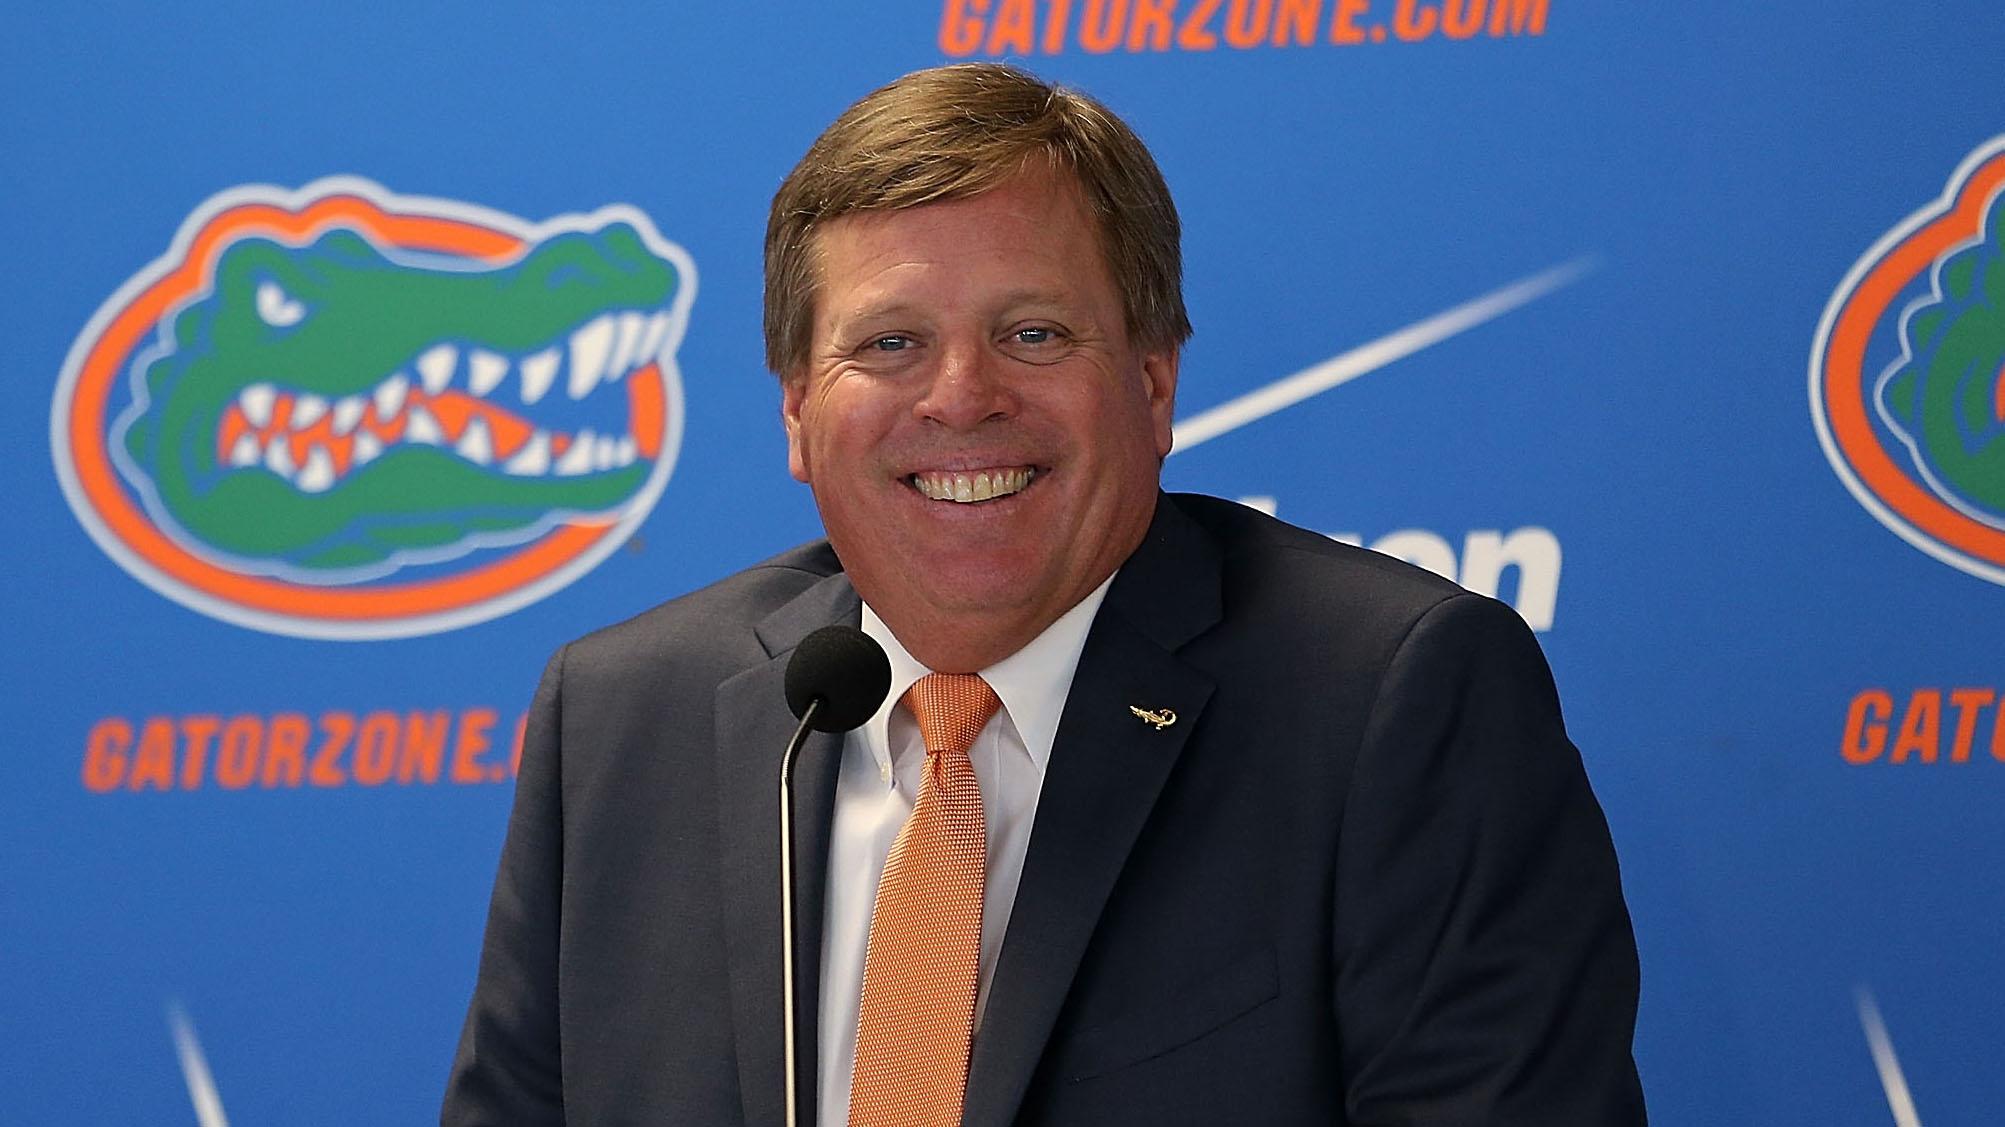 Florida coach Jim McElwain hates nude shark photo